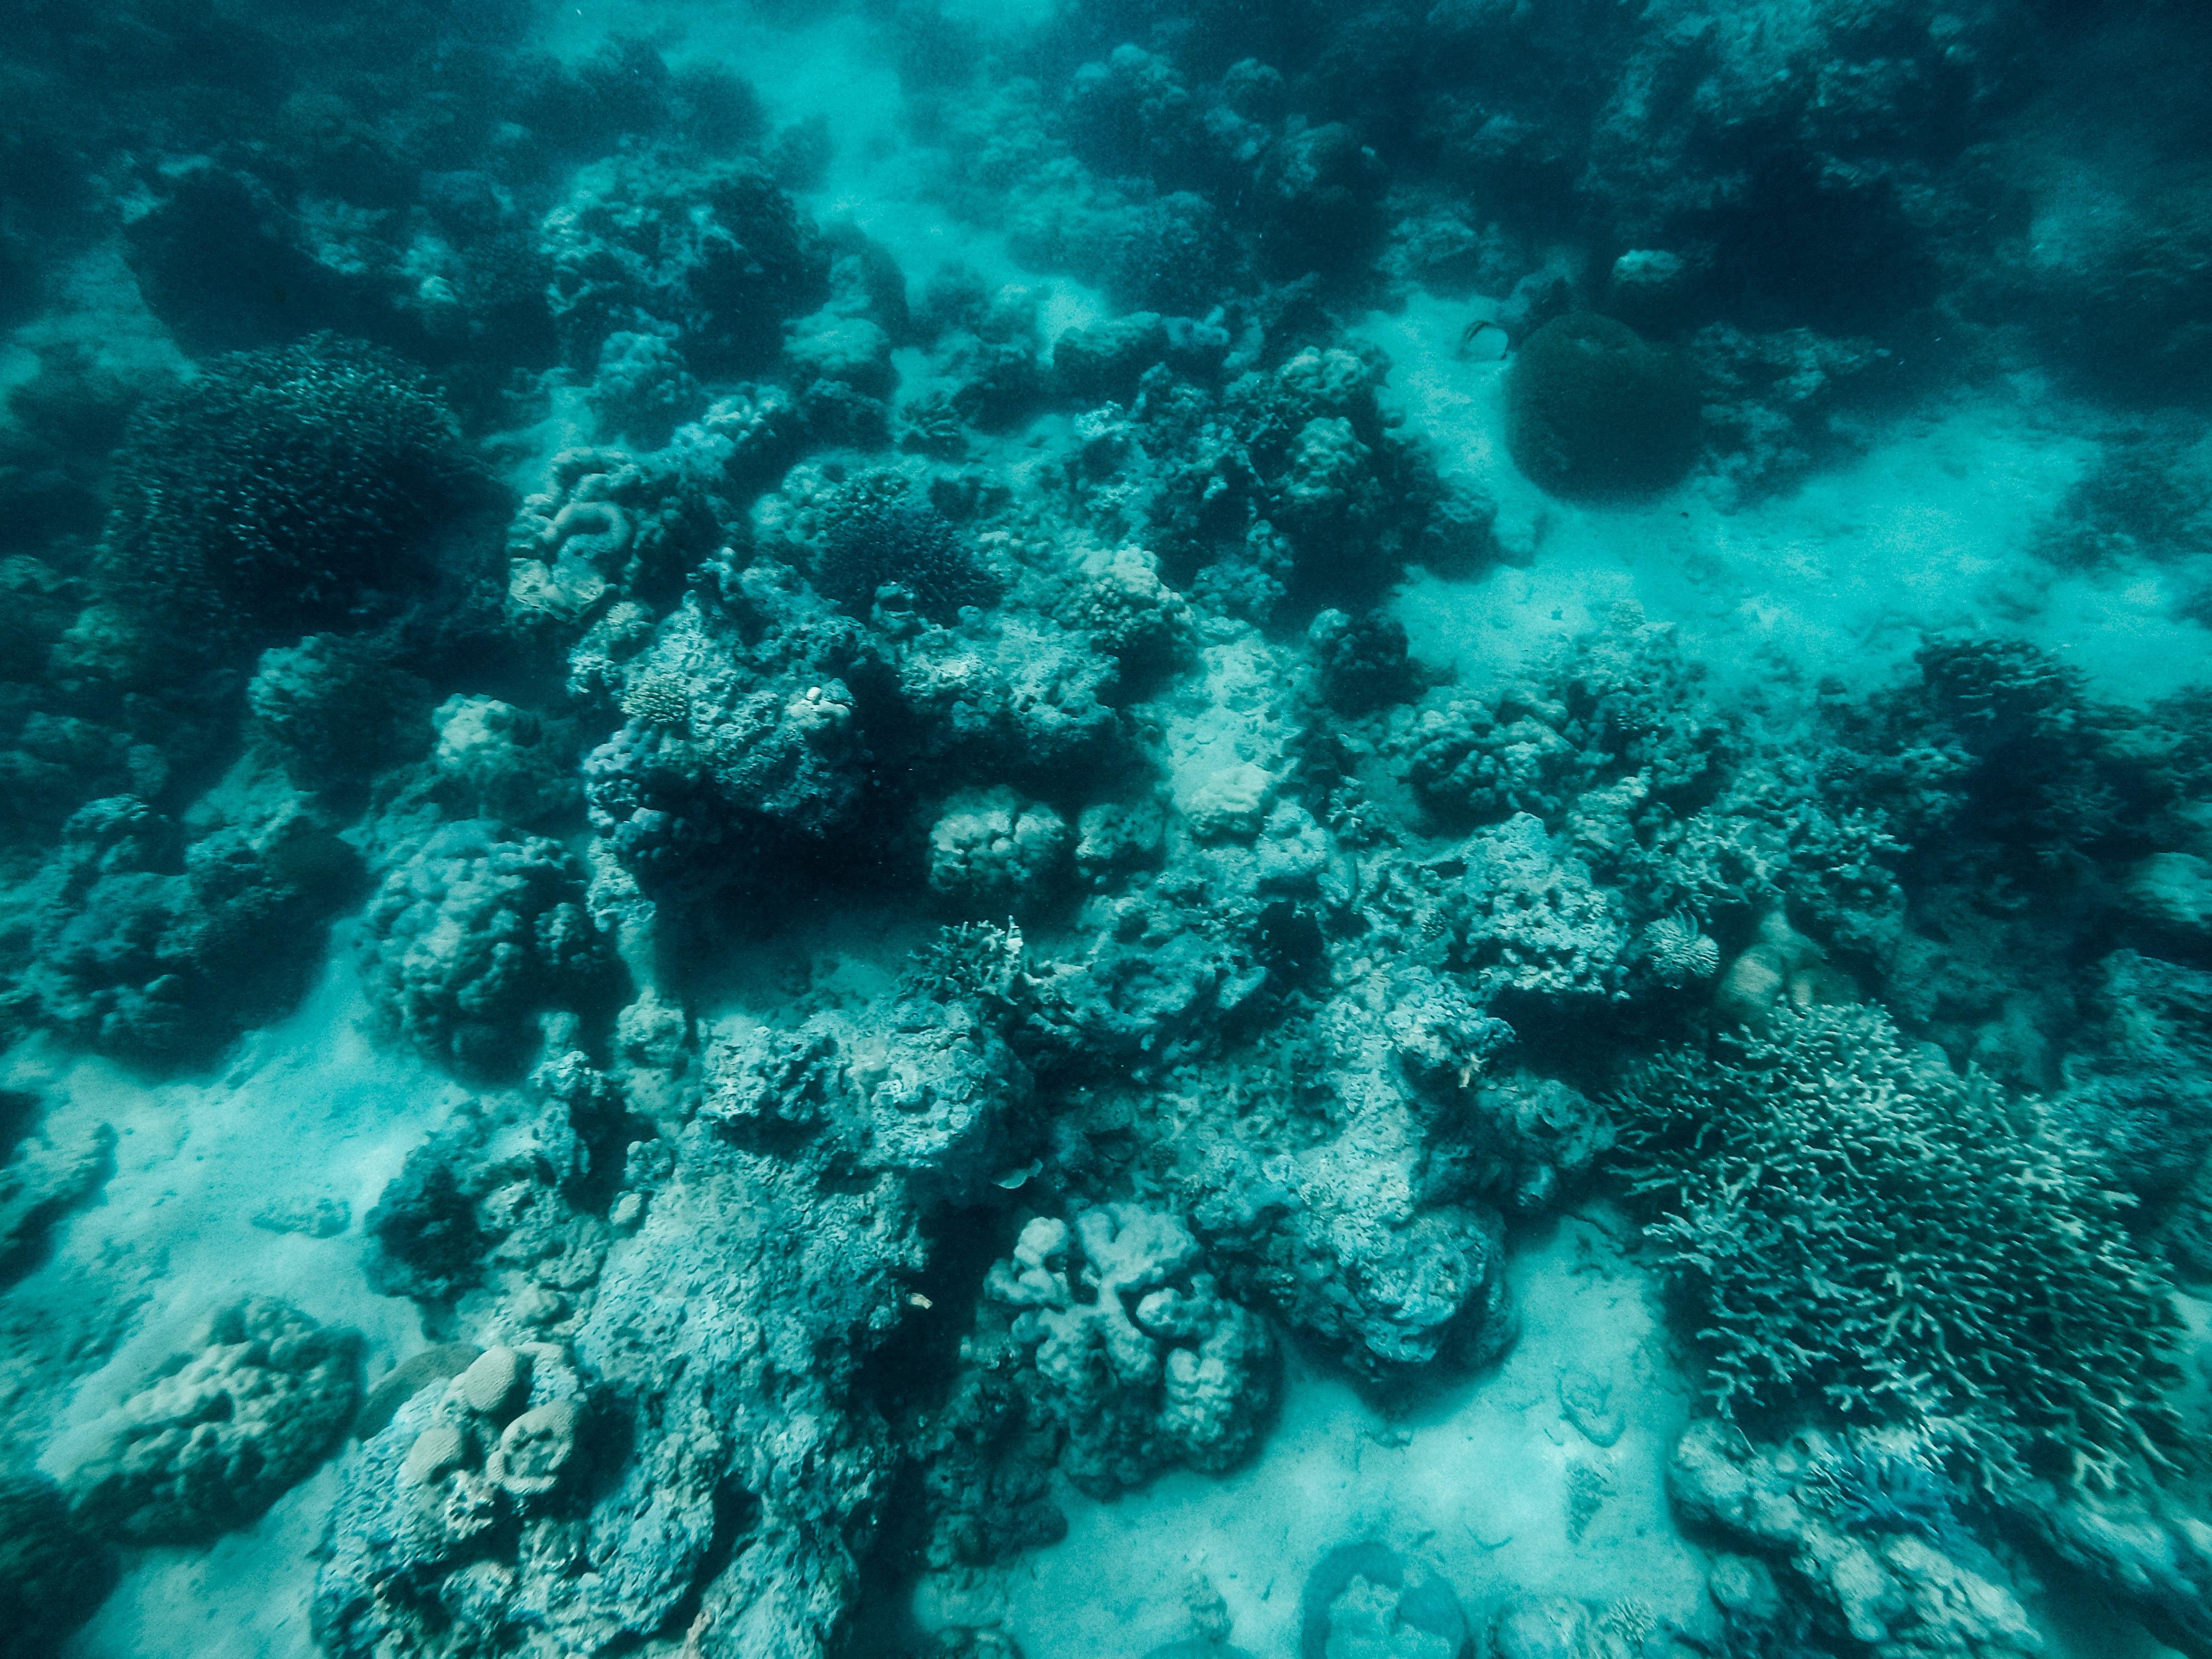 How to get to Carabao Island, Carabao Island travel guide, what to do in Carabao Island, Carabao Island, snorkeling in Carabao Island